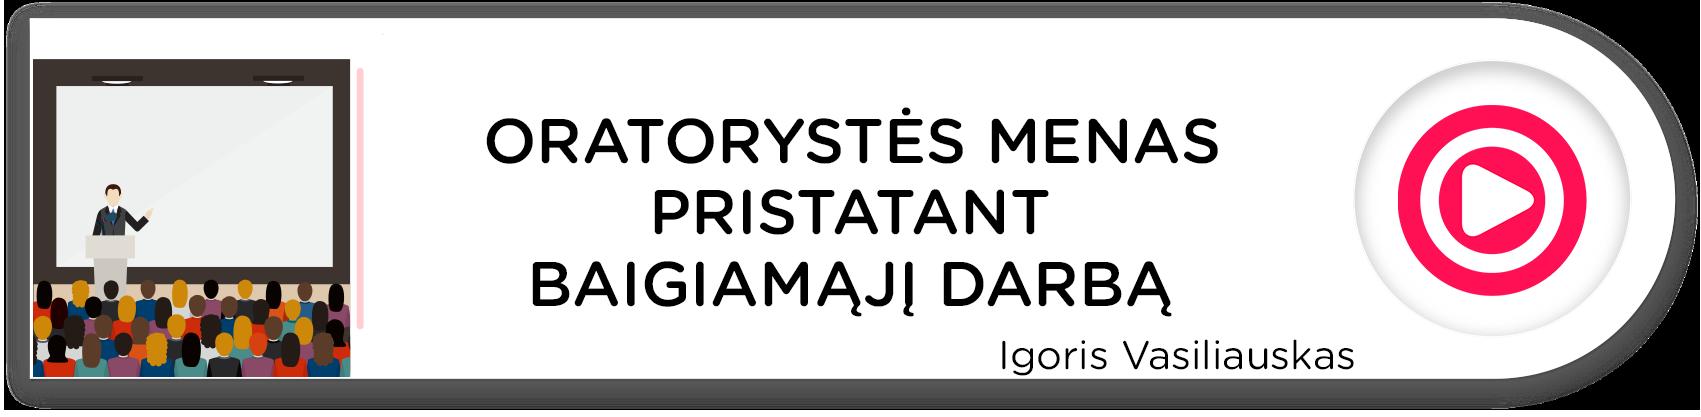 oratoryste